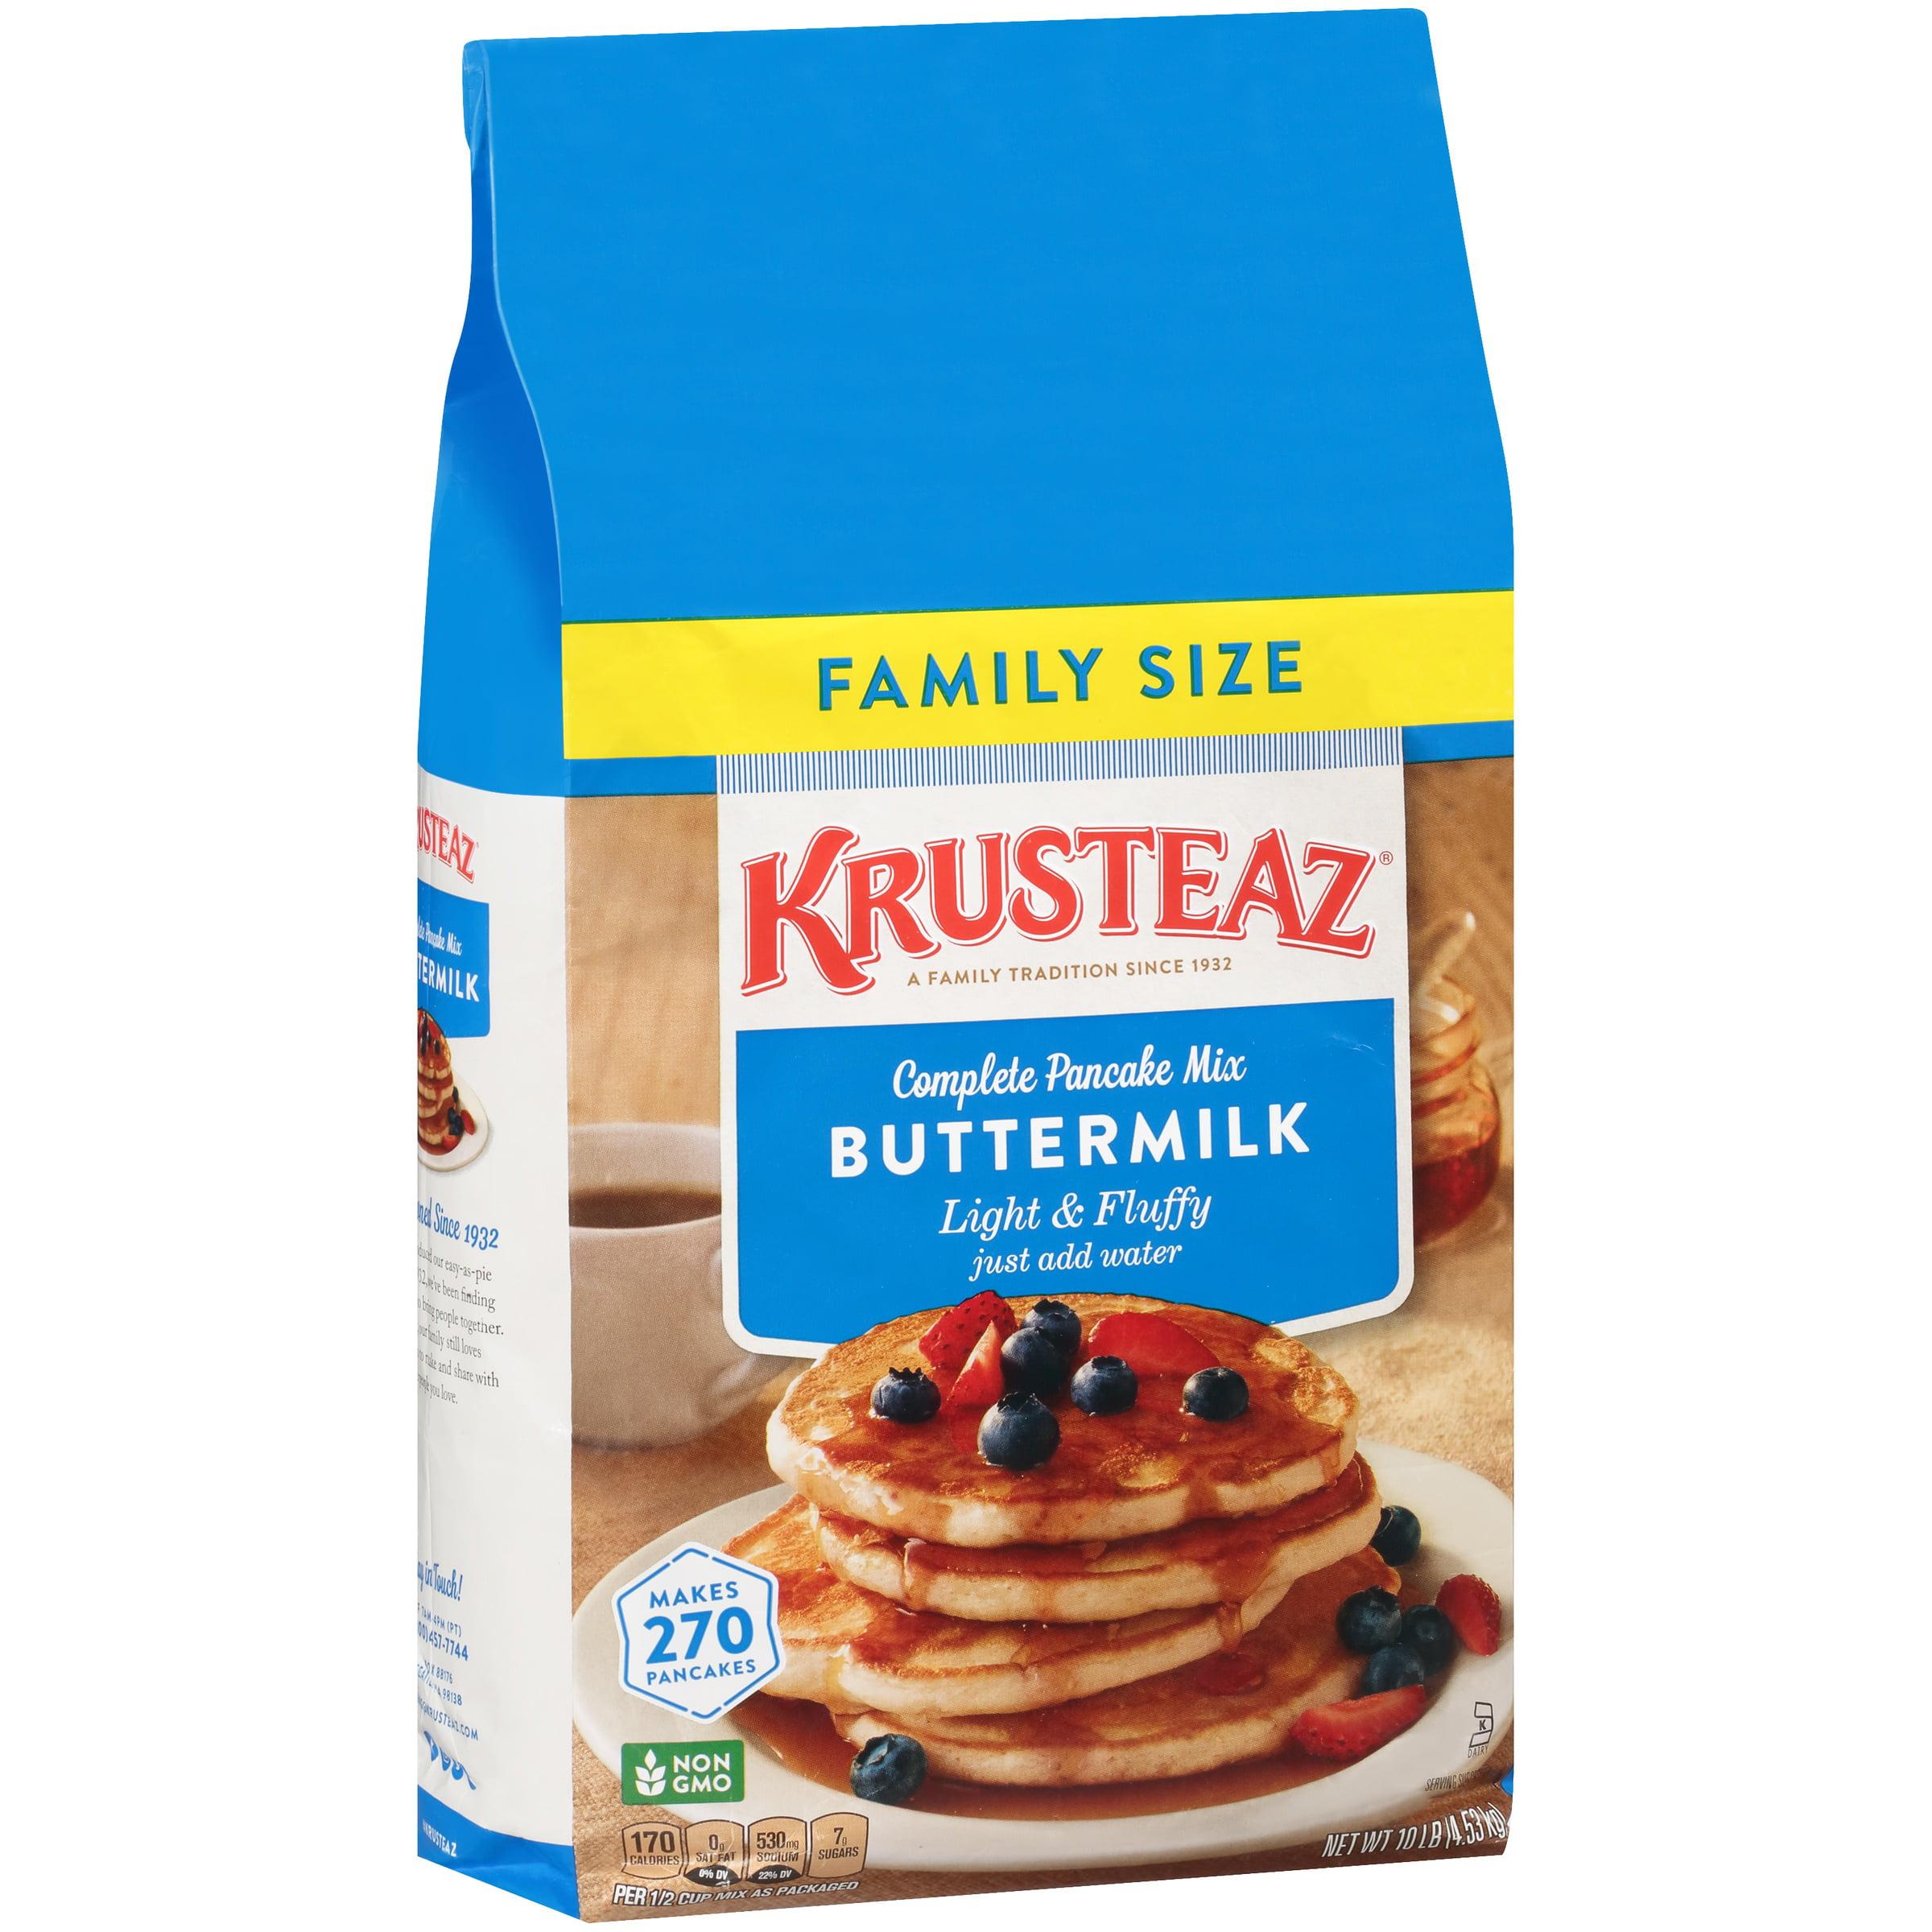 Krusteaz Complete Buttermilk Pancake Mix, 10 lbs Family Size Bag